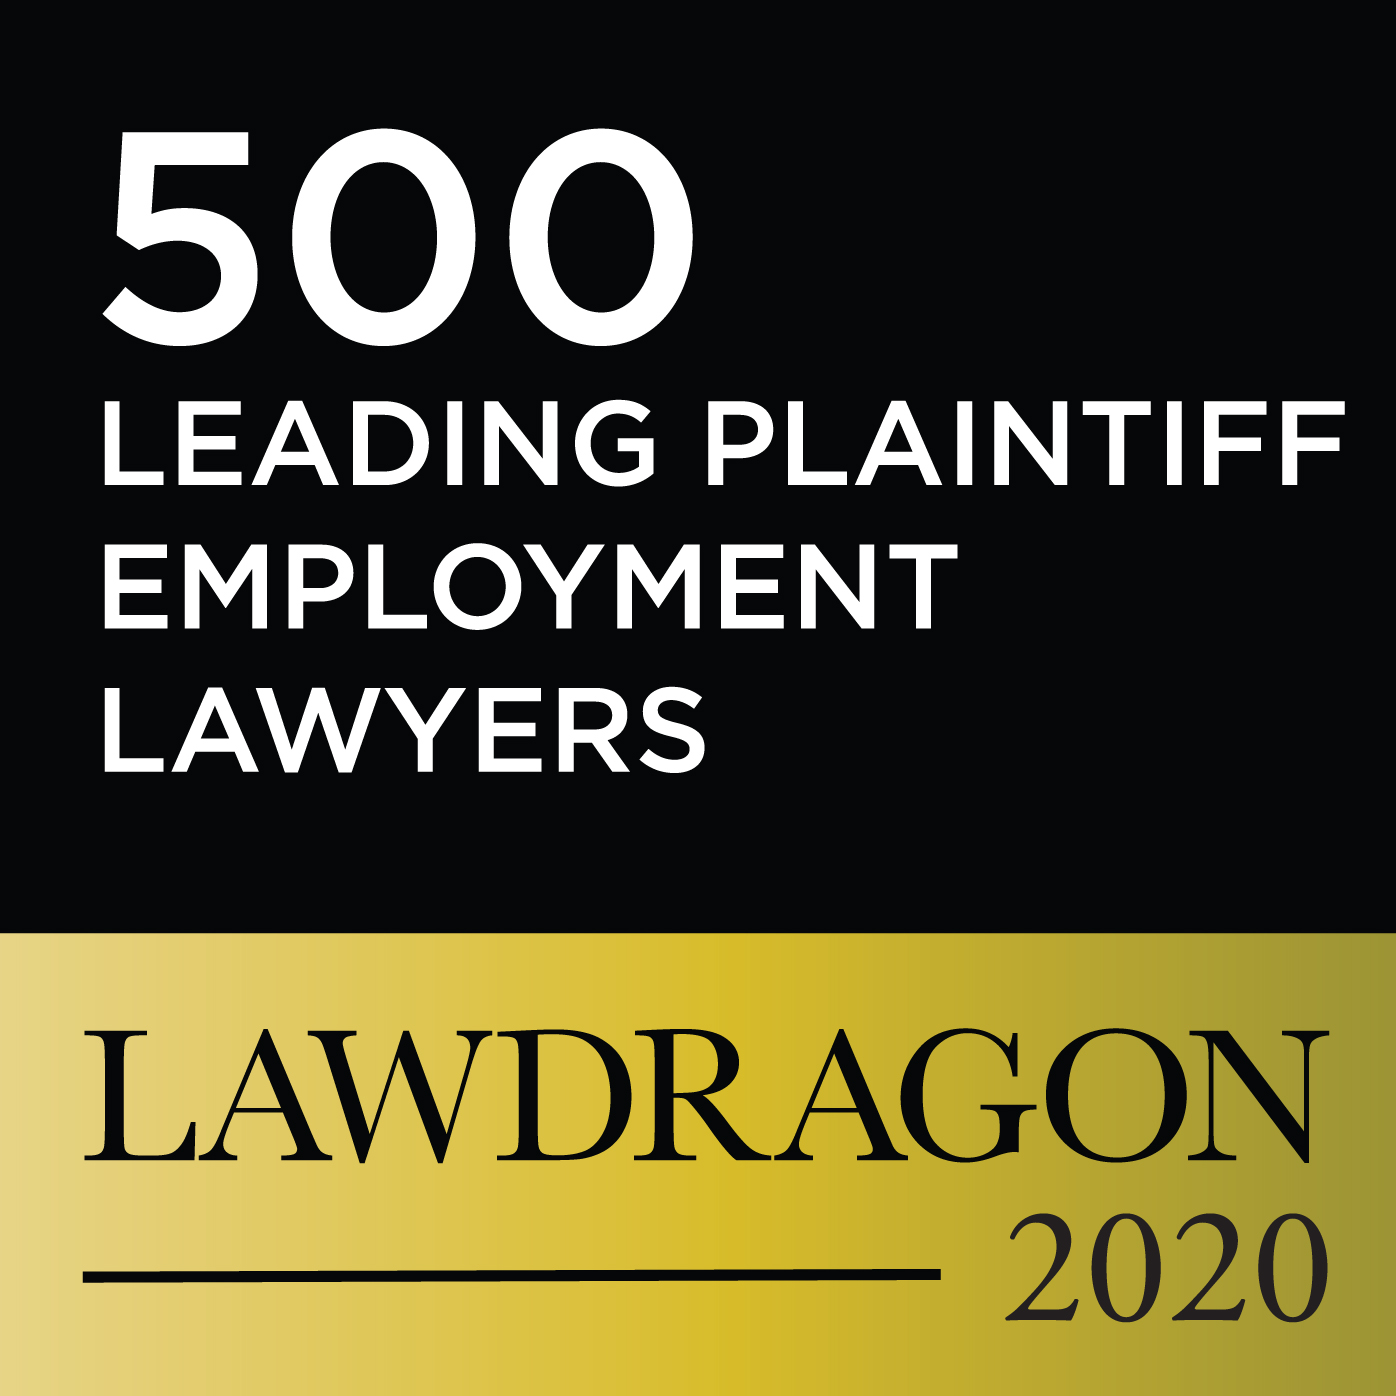 500 Leading Plaintiff Employment Lawyers, Lawdragon 2020